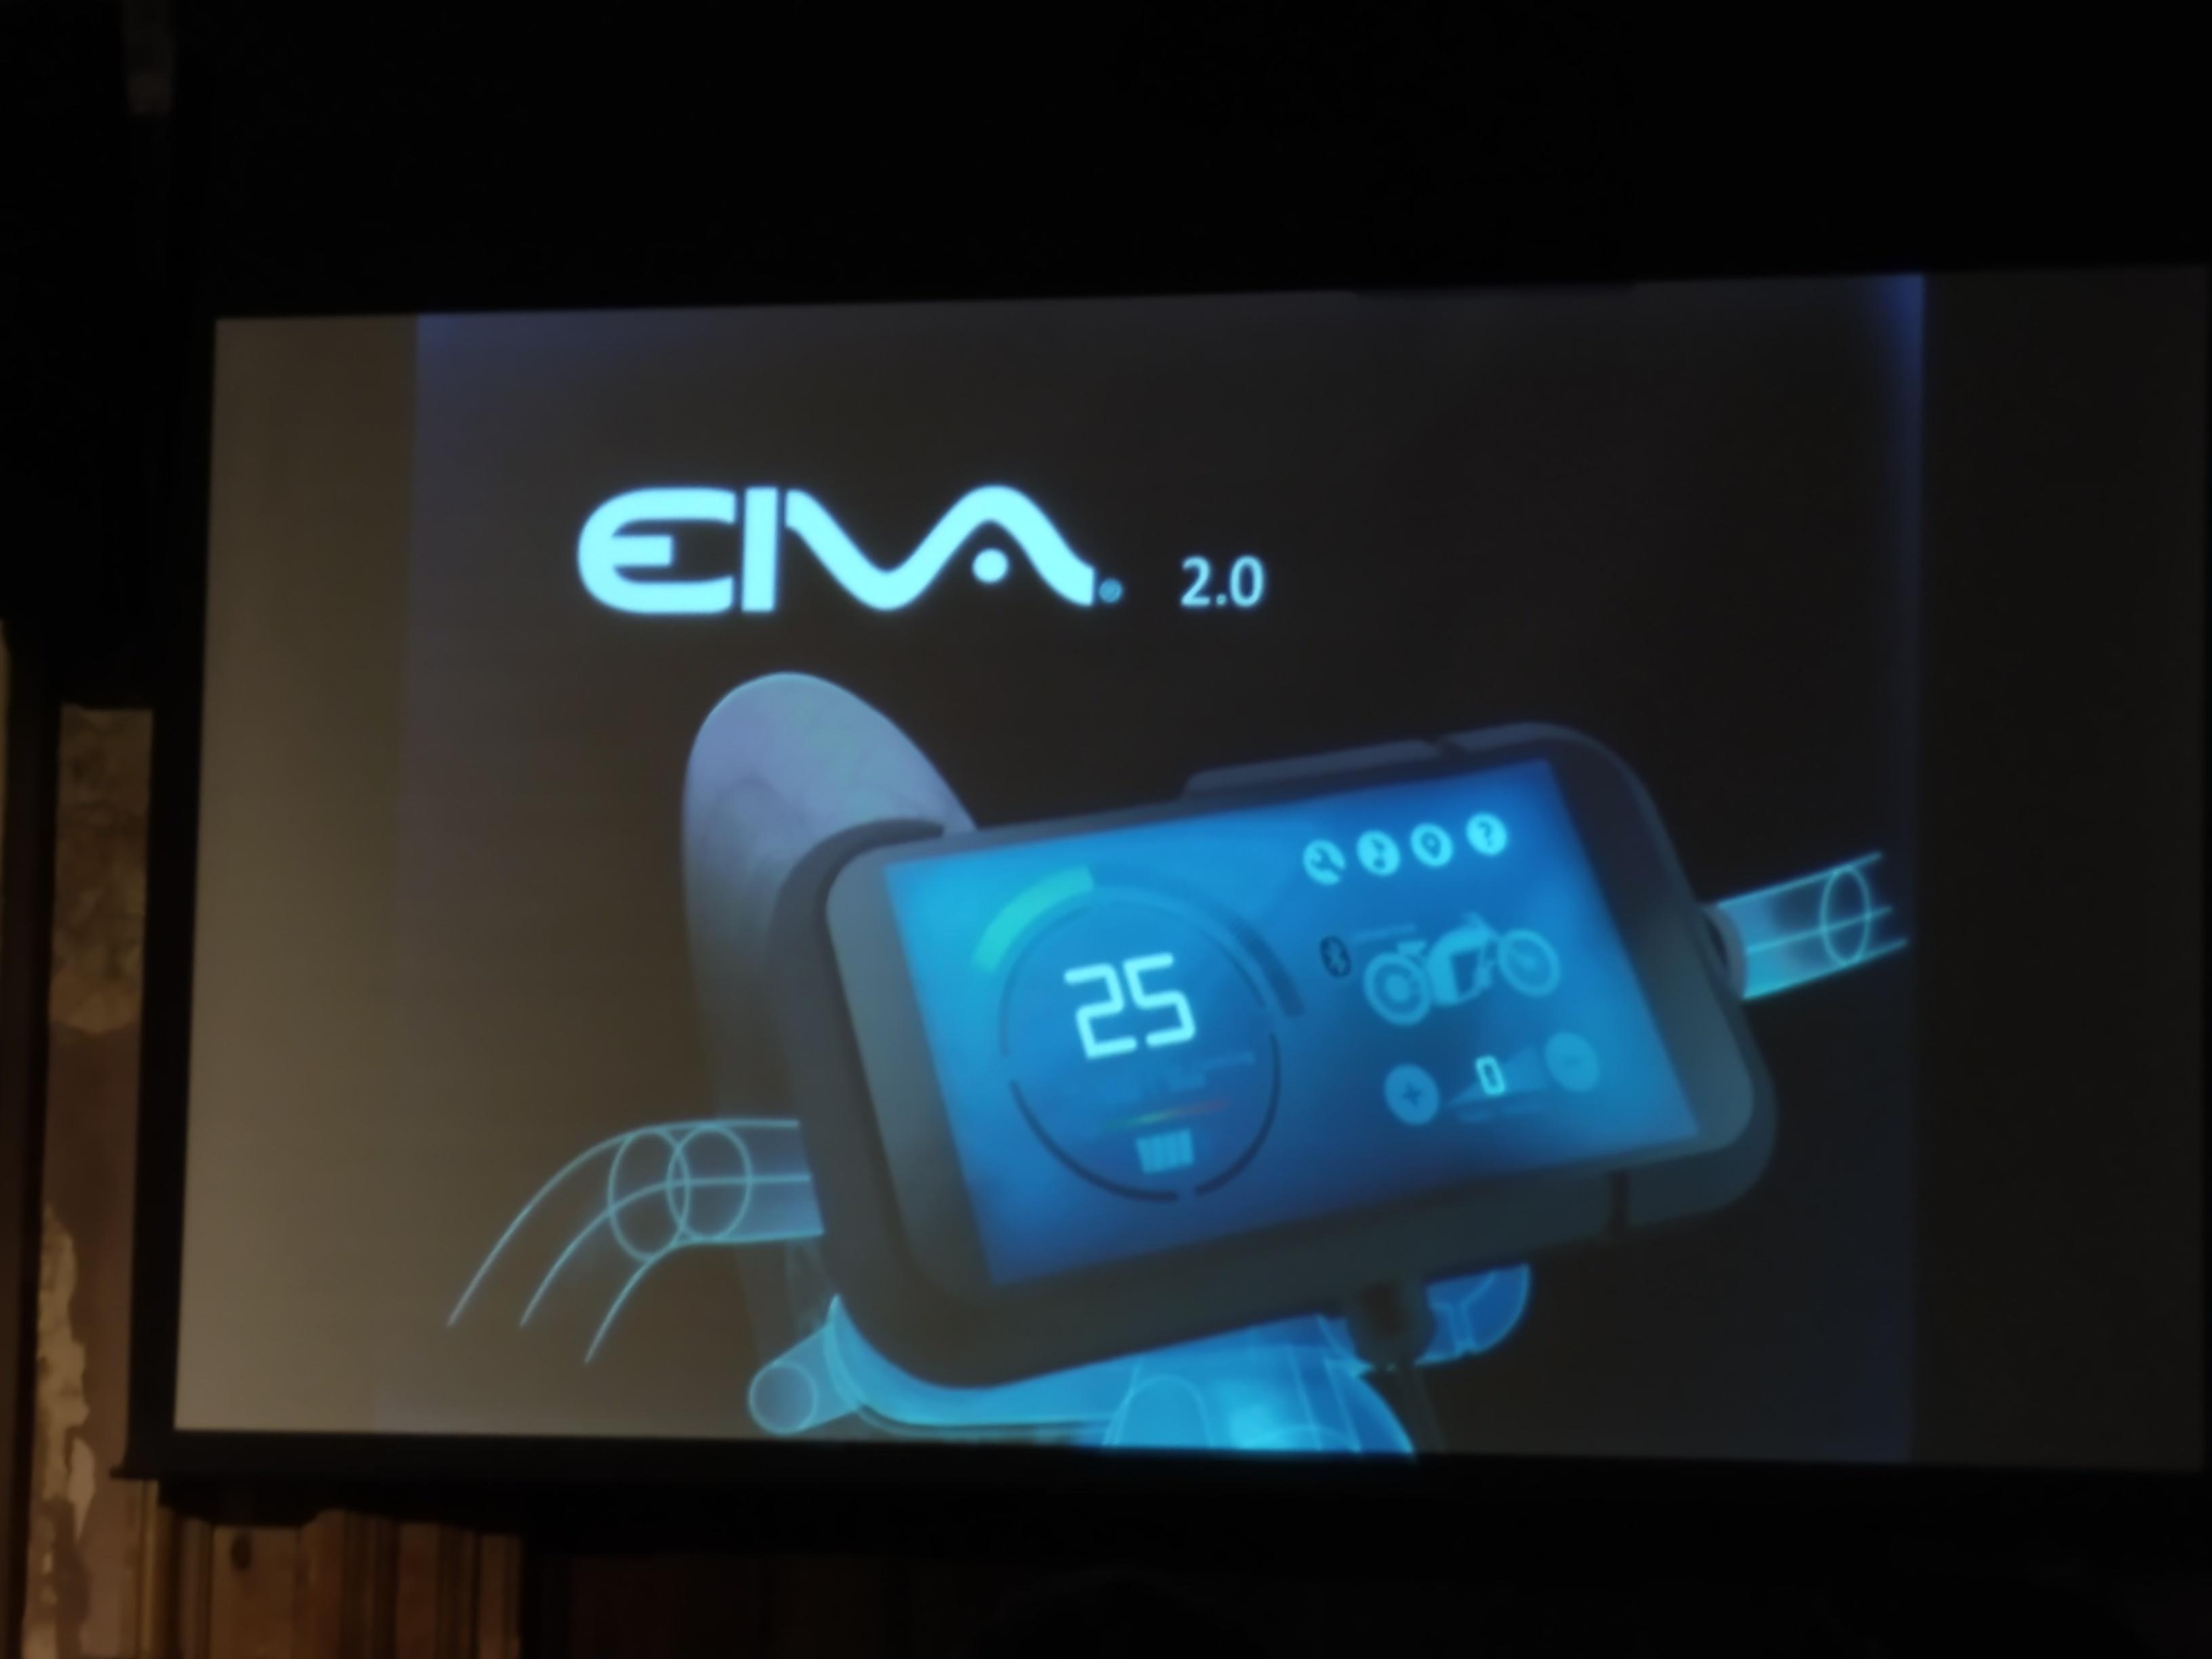 Rayvolt EIVA 2.0